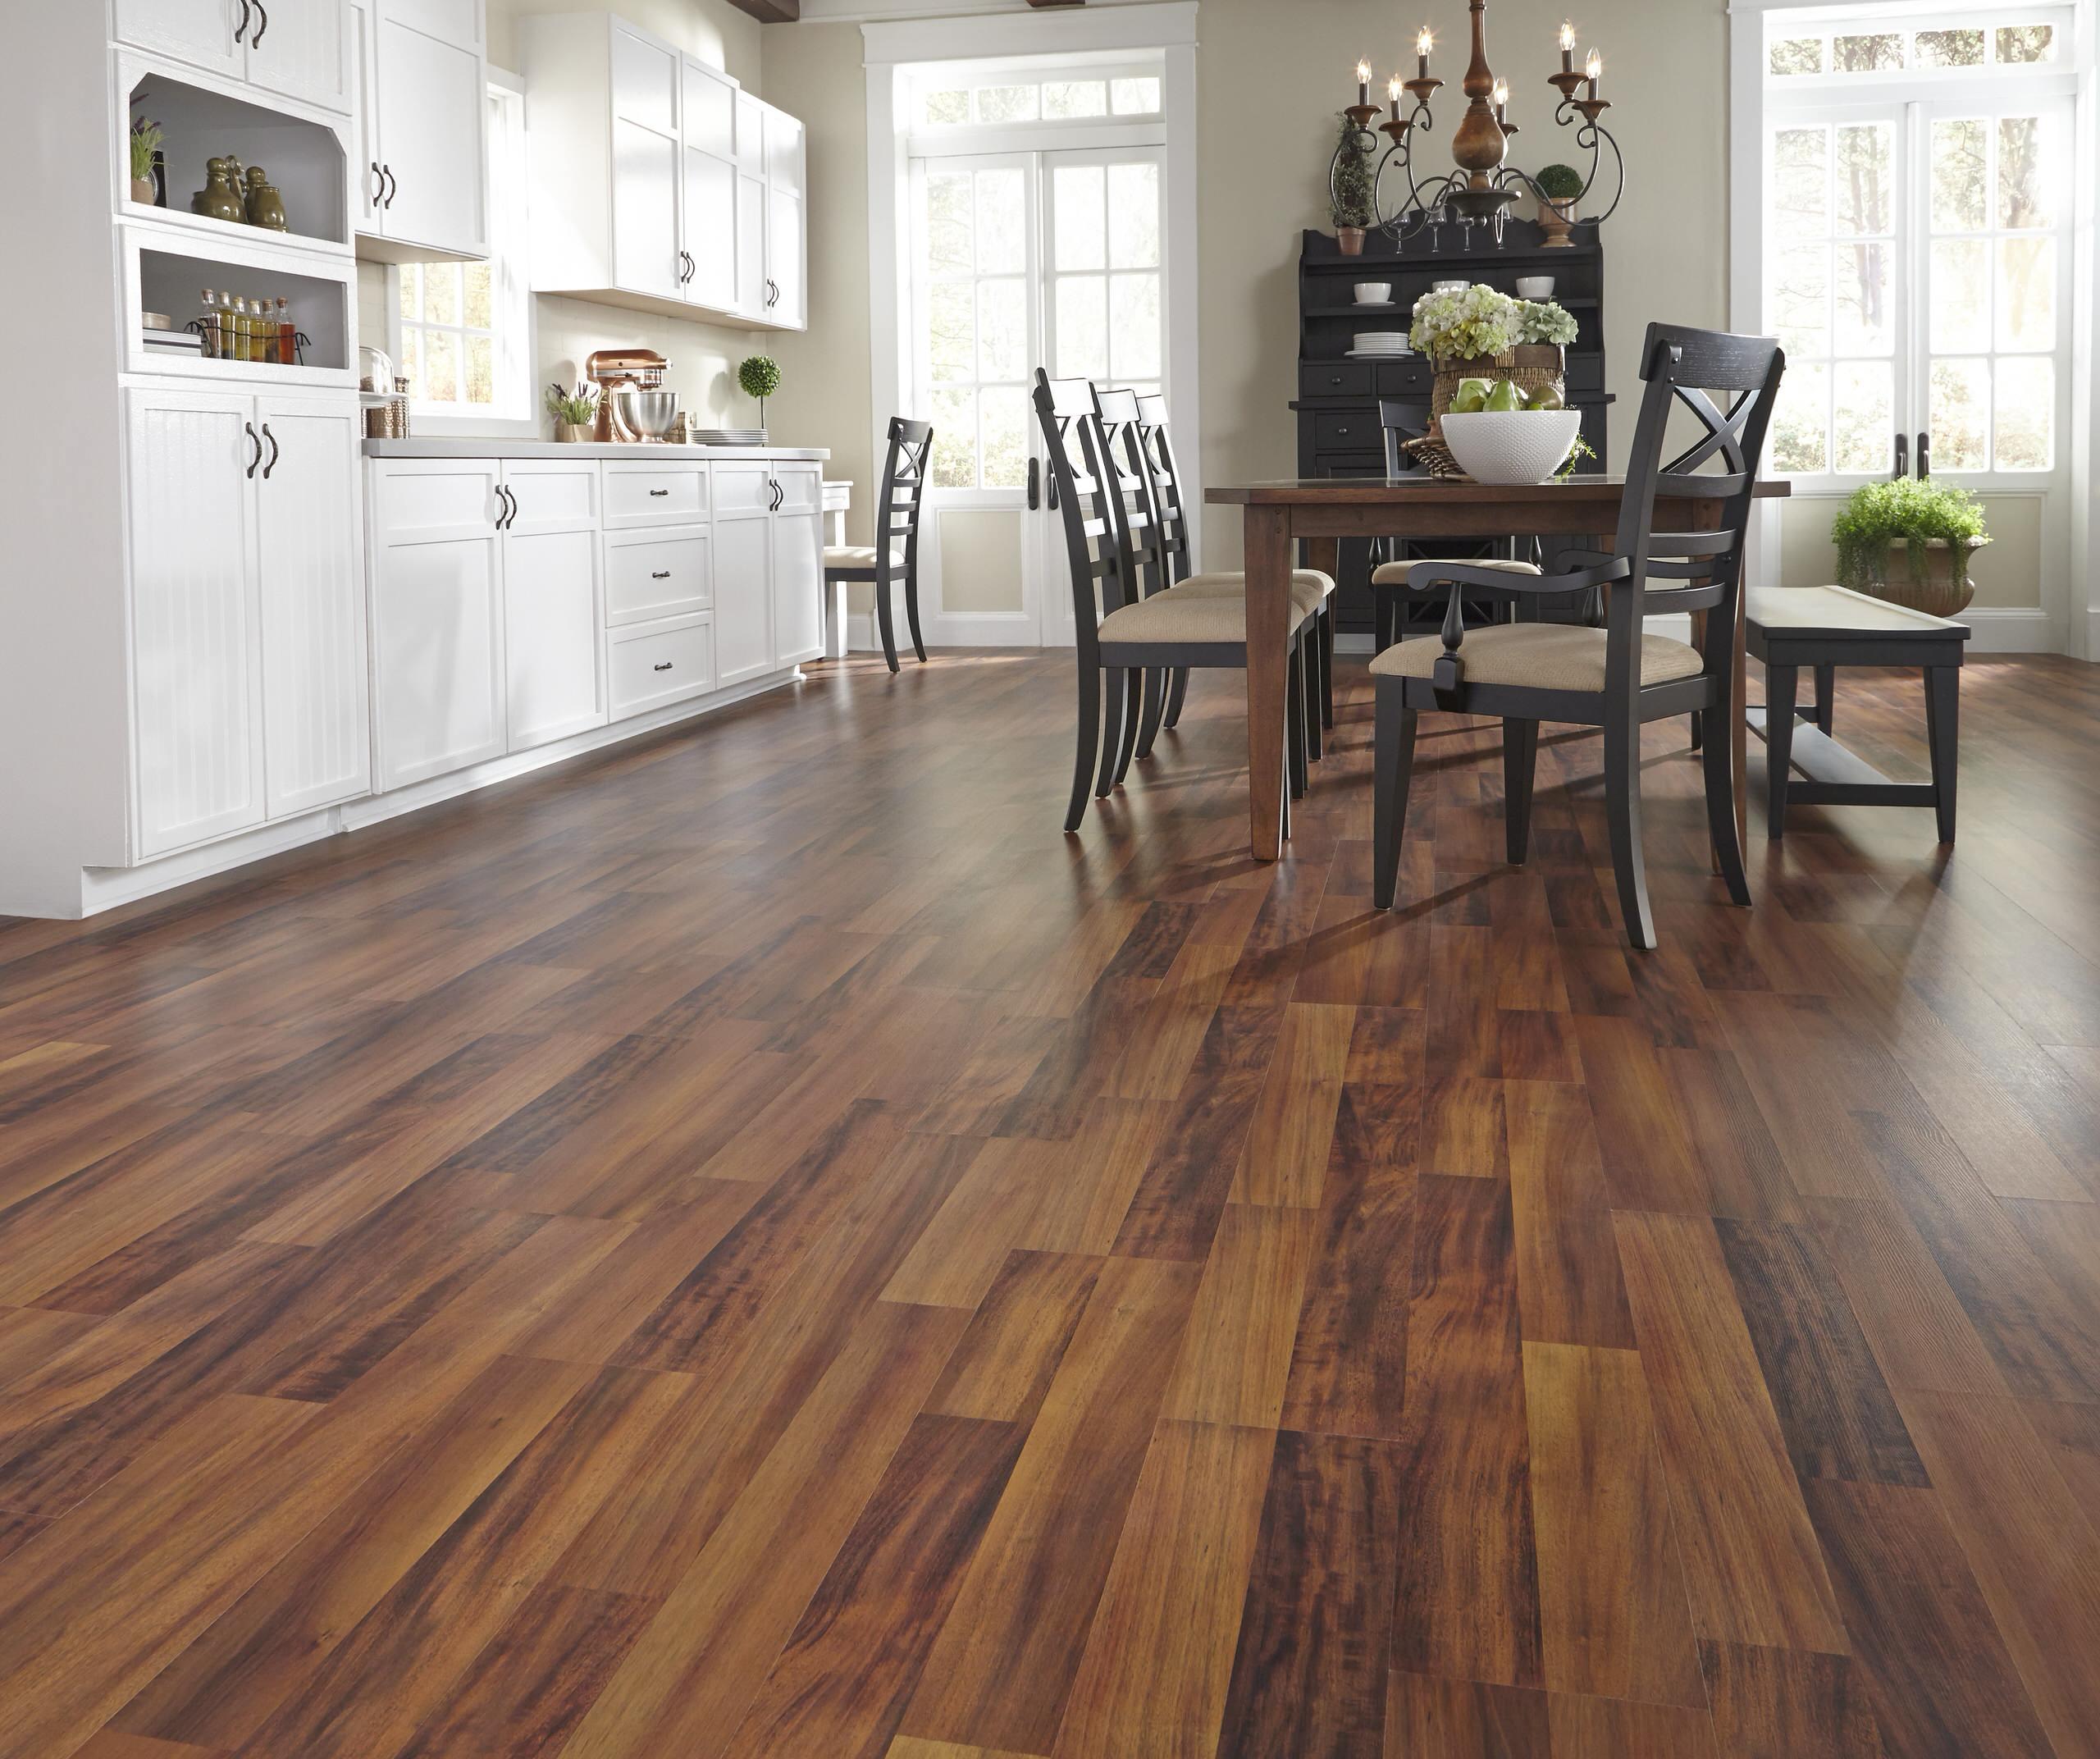 Charisma Plus 8mm Pad Bronzed Brazilian, Charisma Plus Laminate Flooring